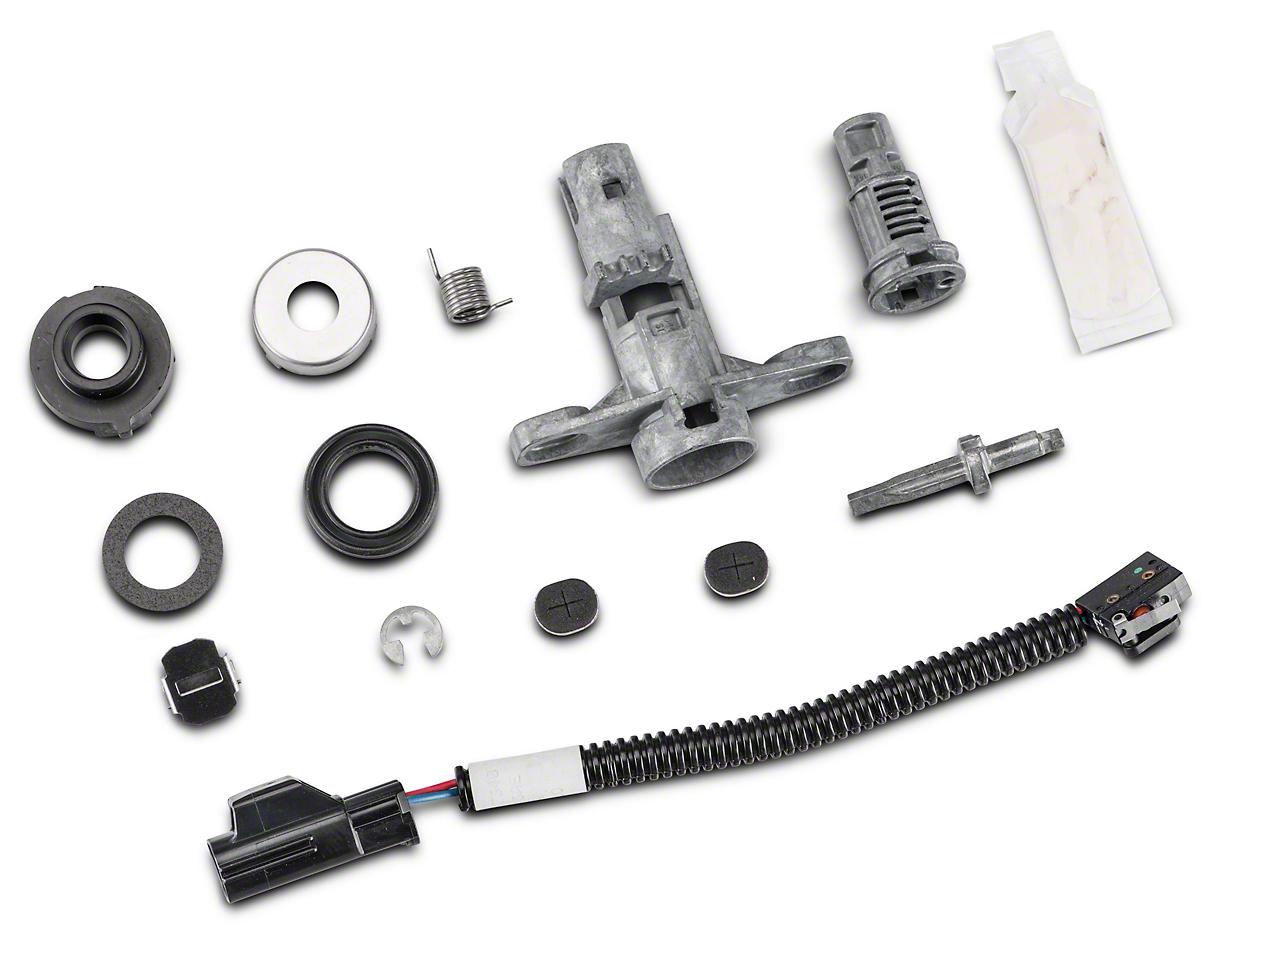 OPR Trunk Lock Service Set (05-14 All)